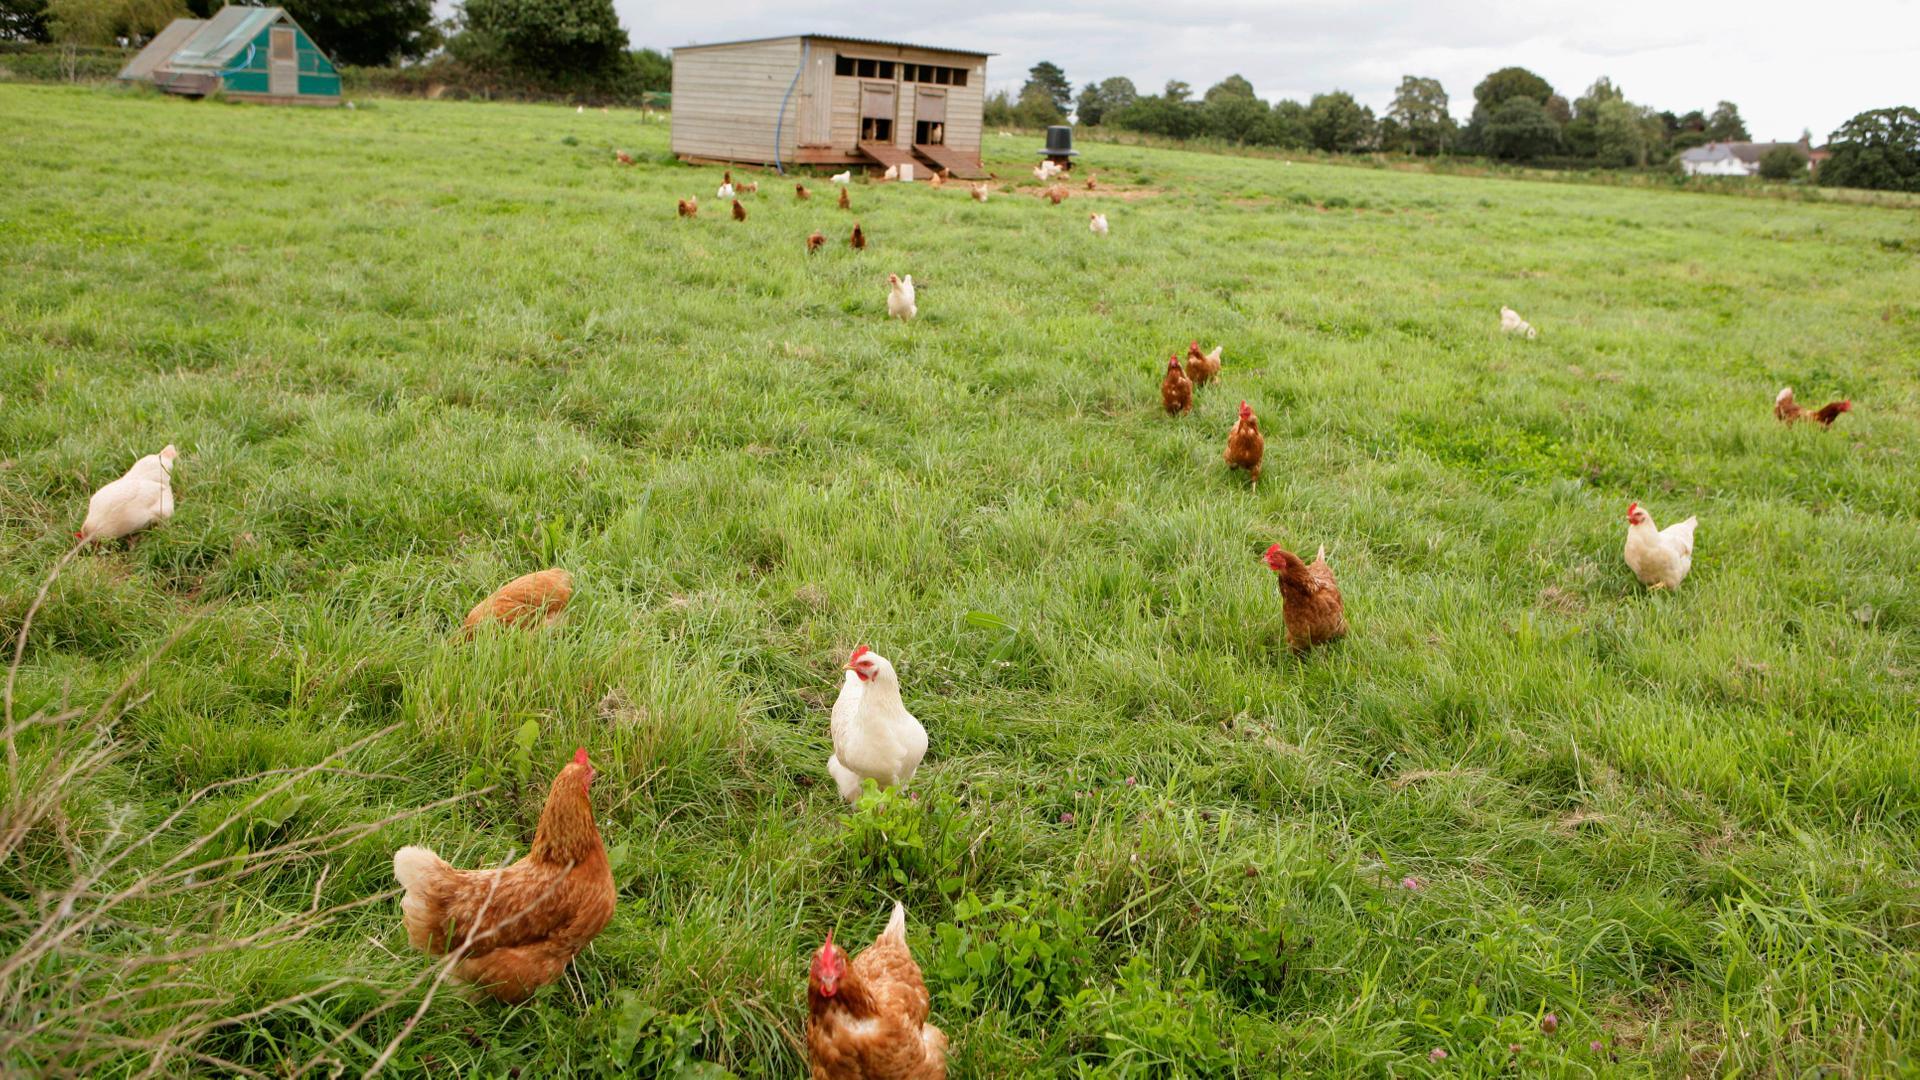 Free range chickens in pasture